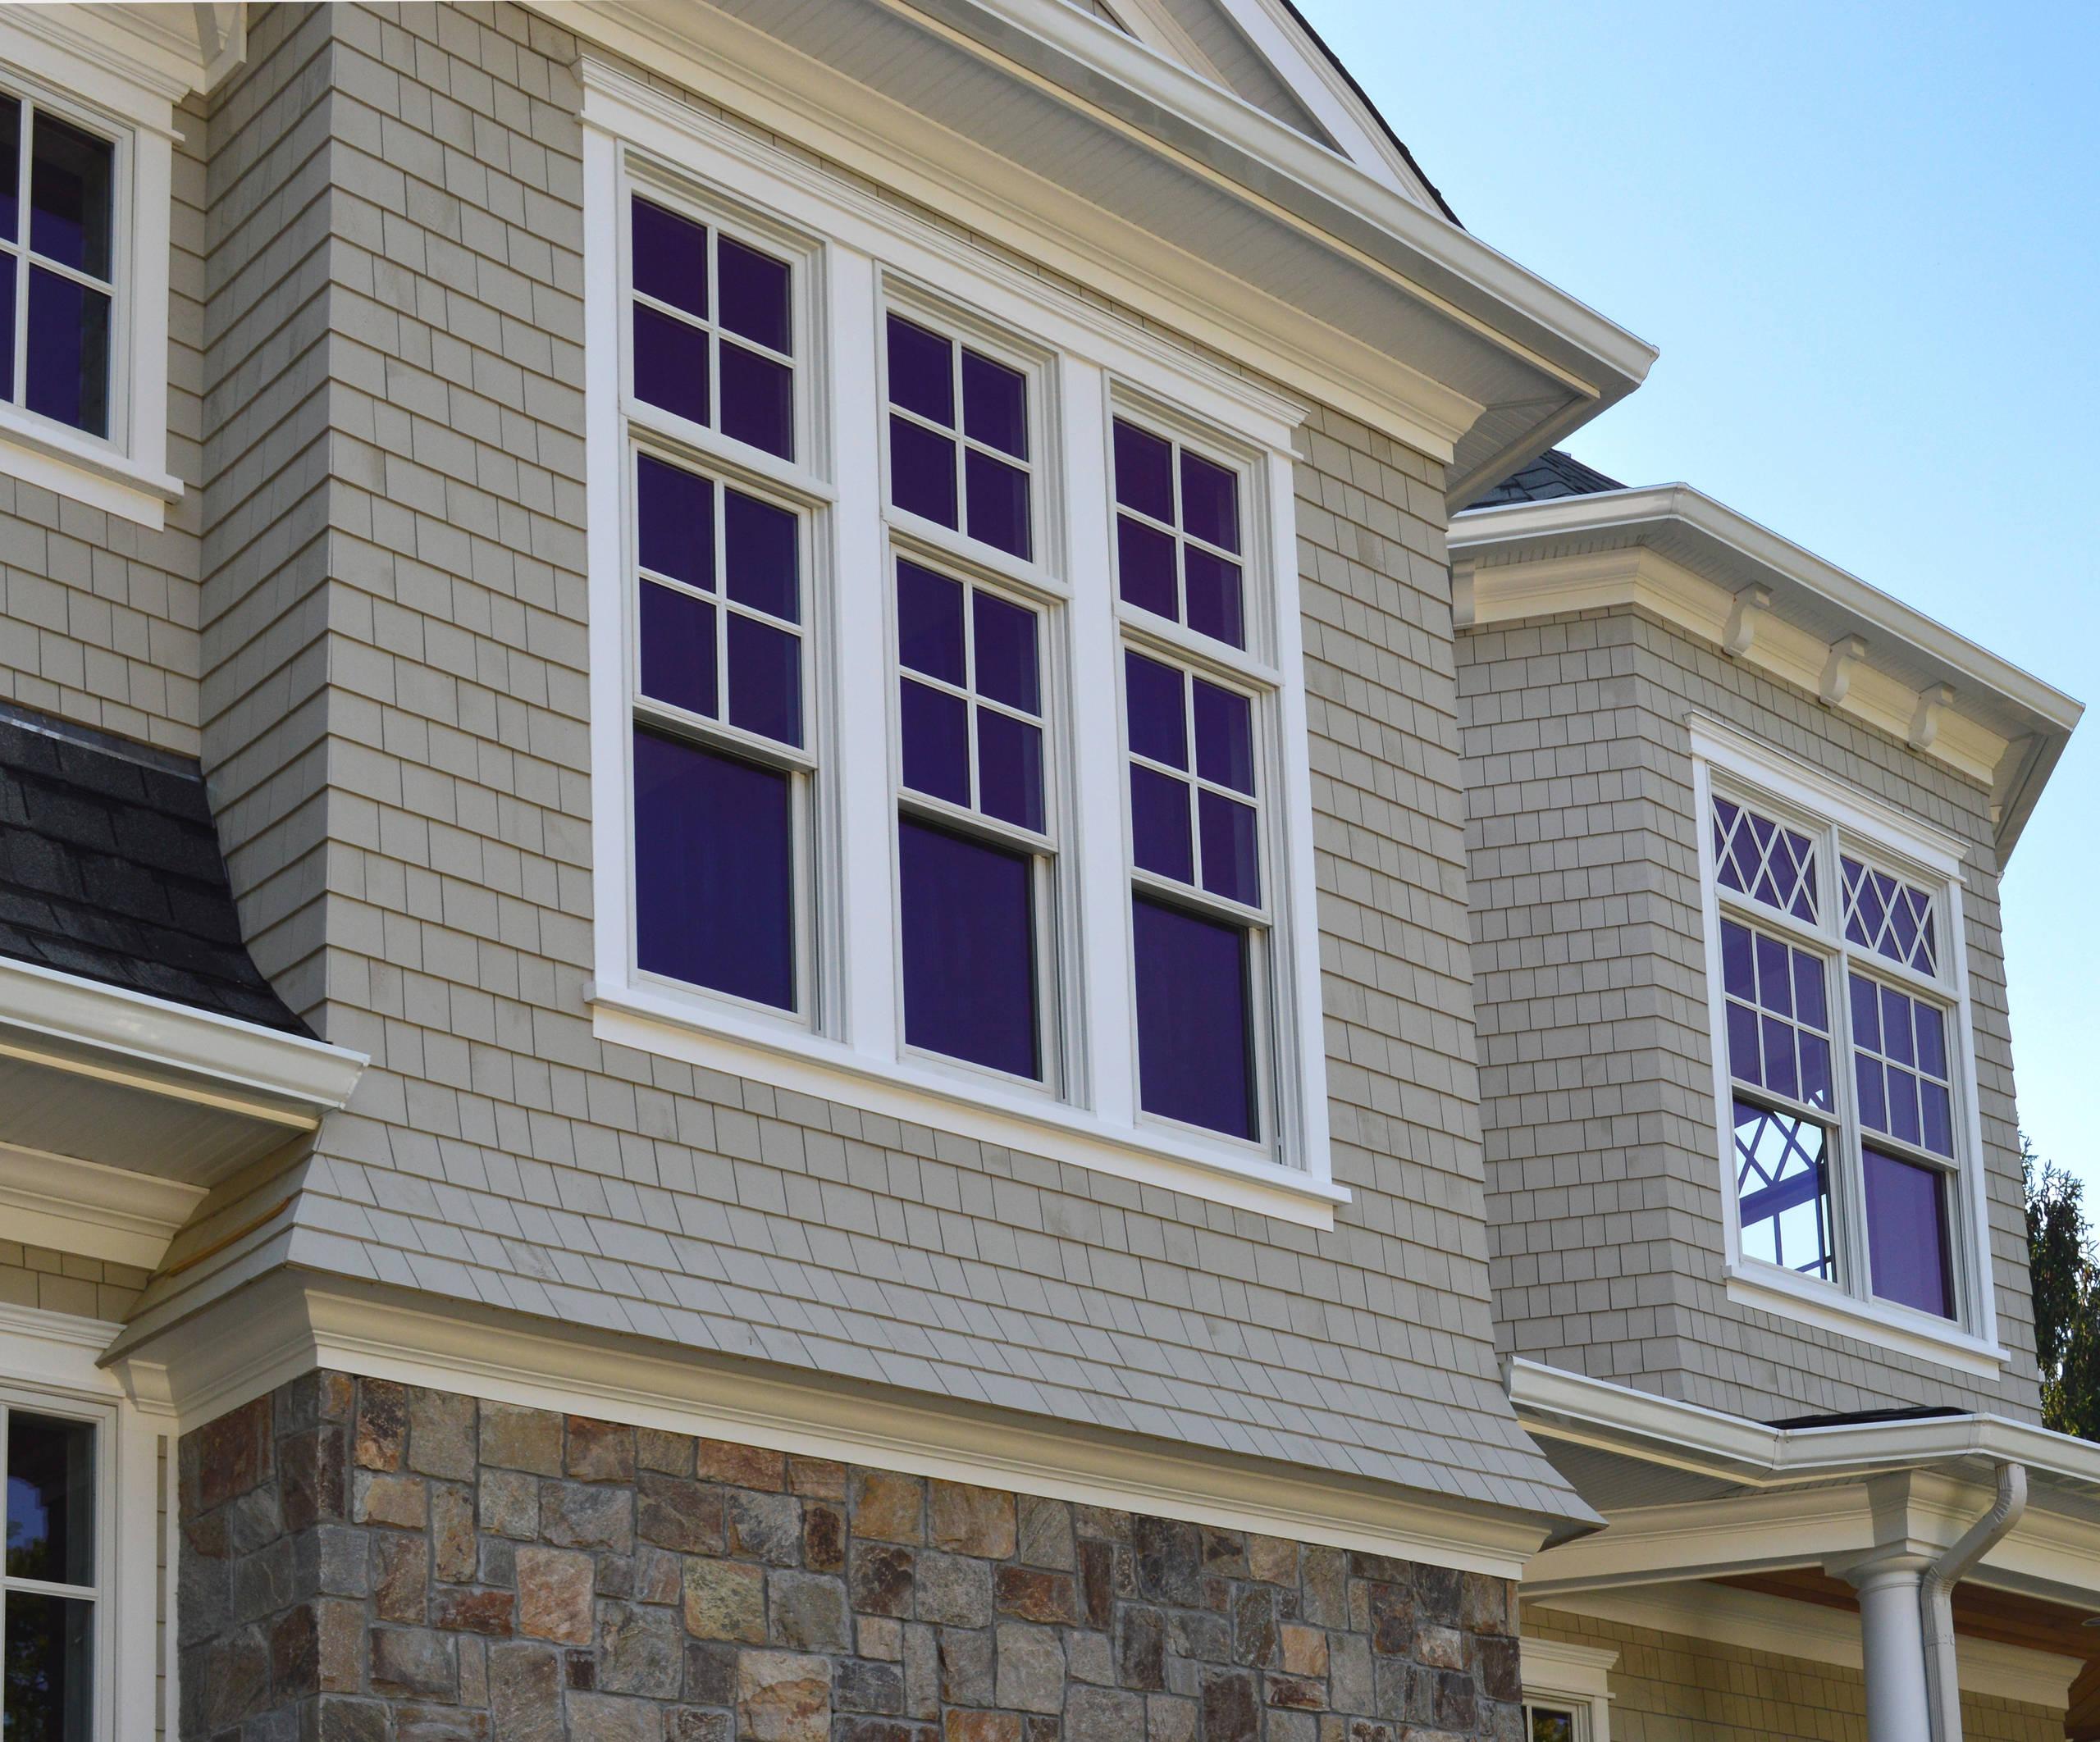 Shingle Style Home in Saddle River, NJ